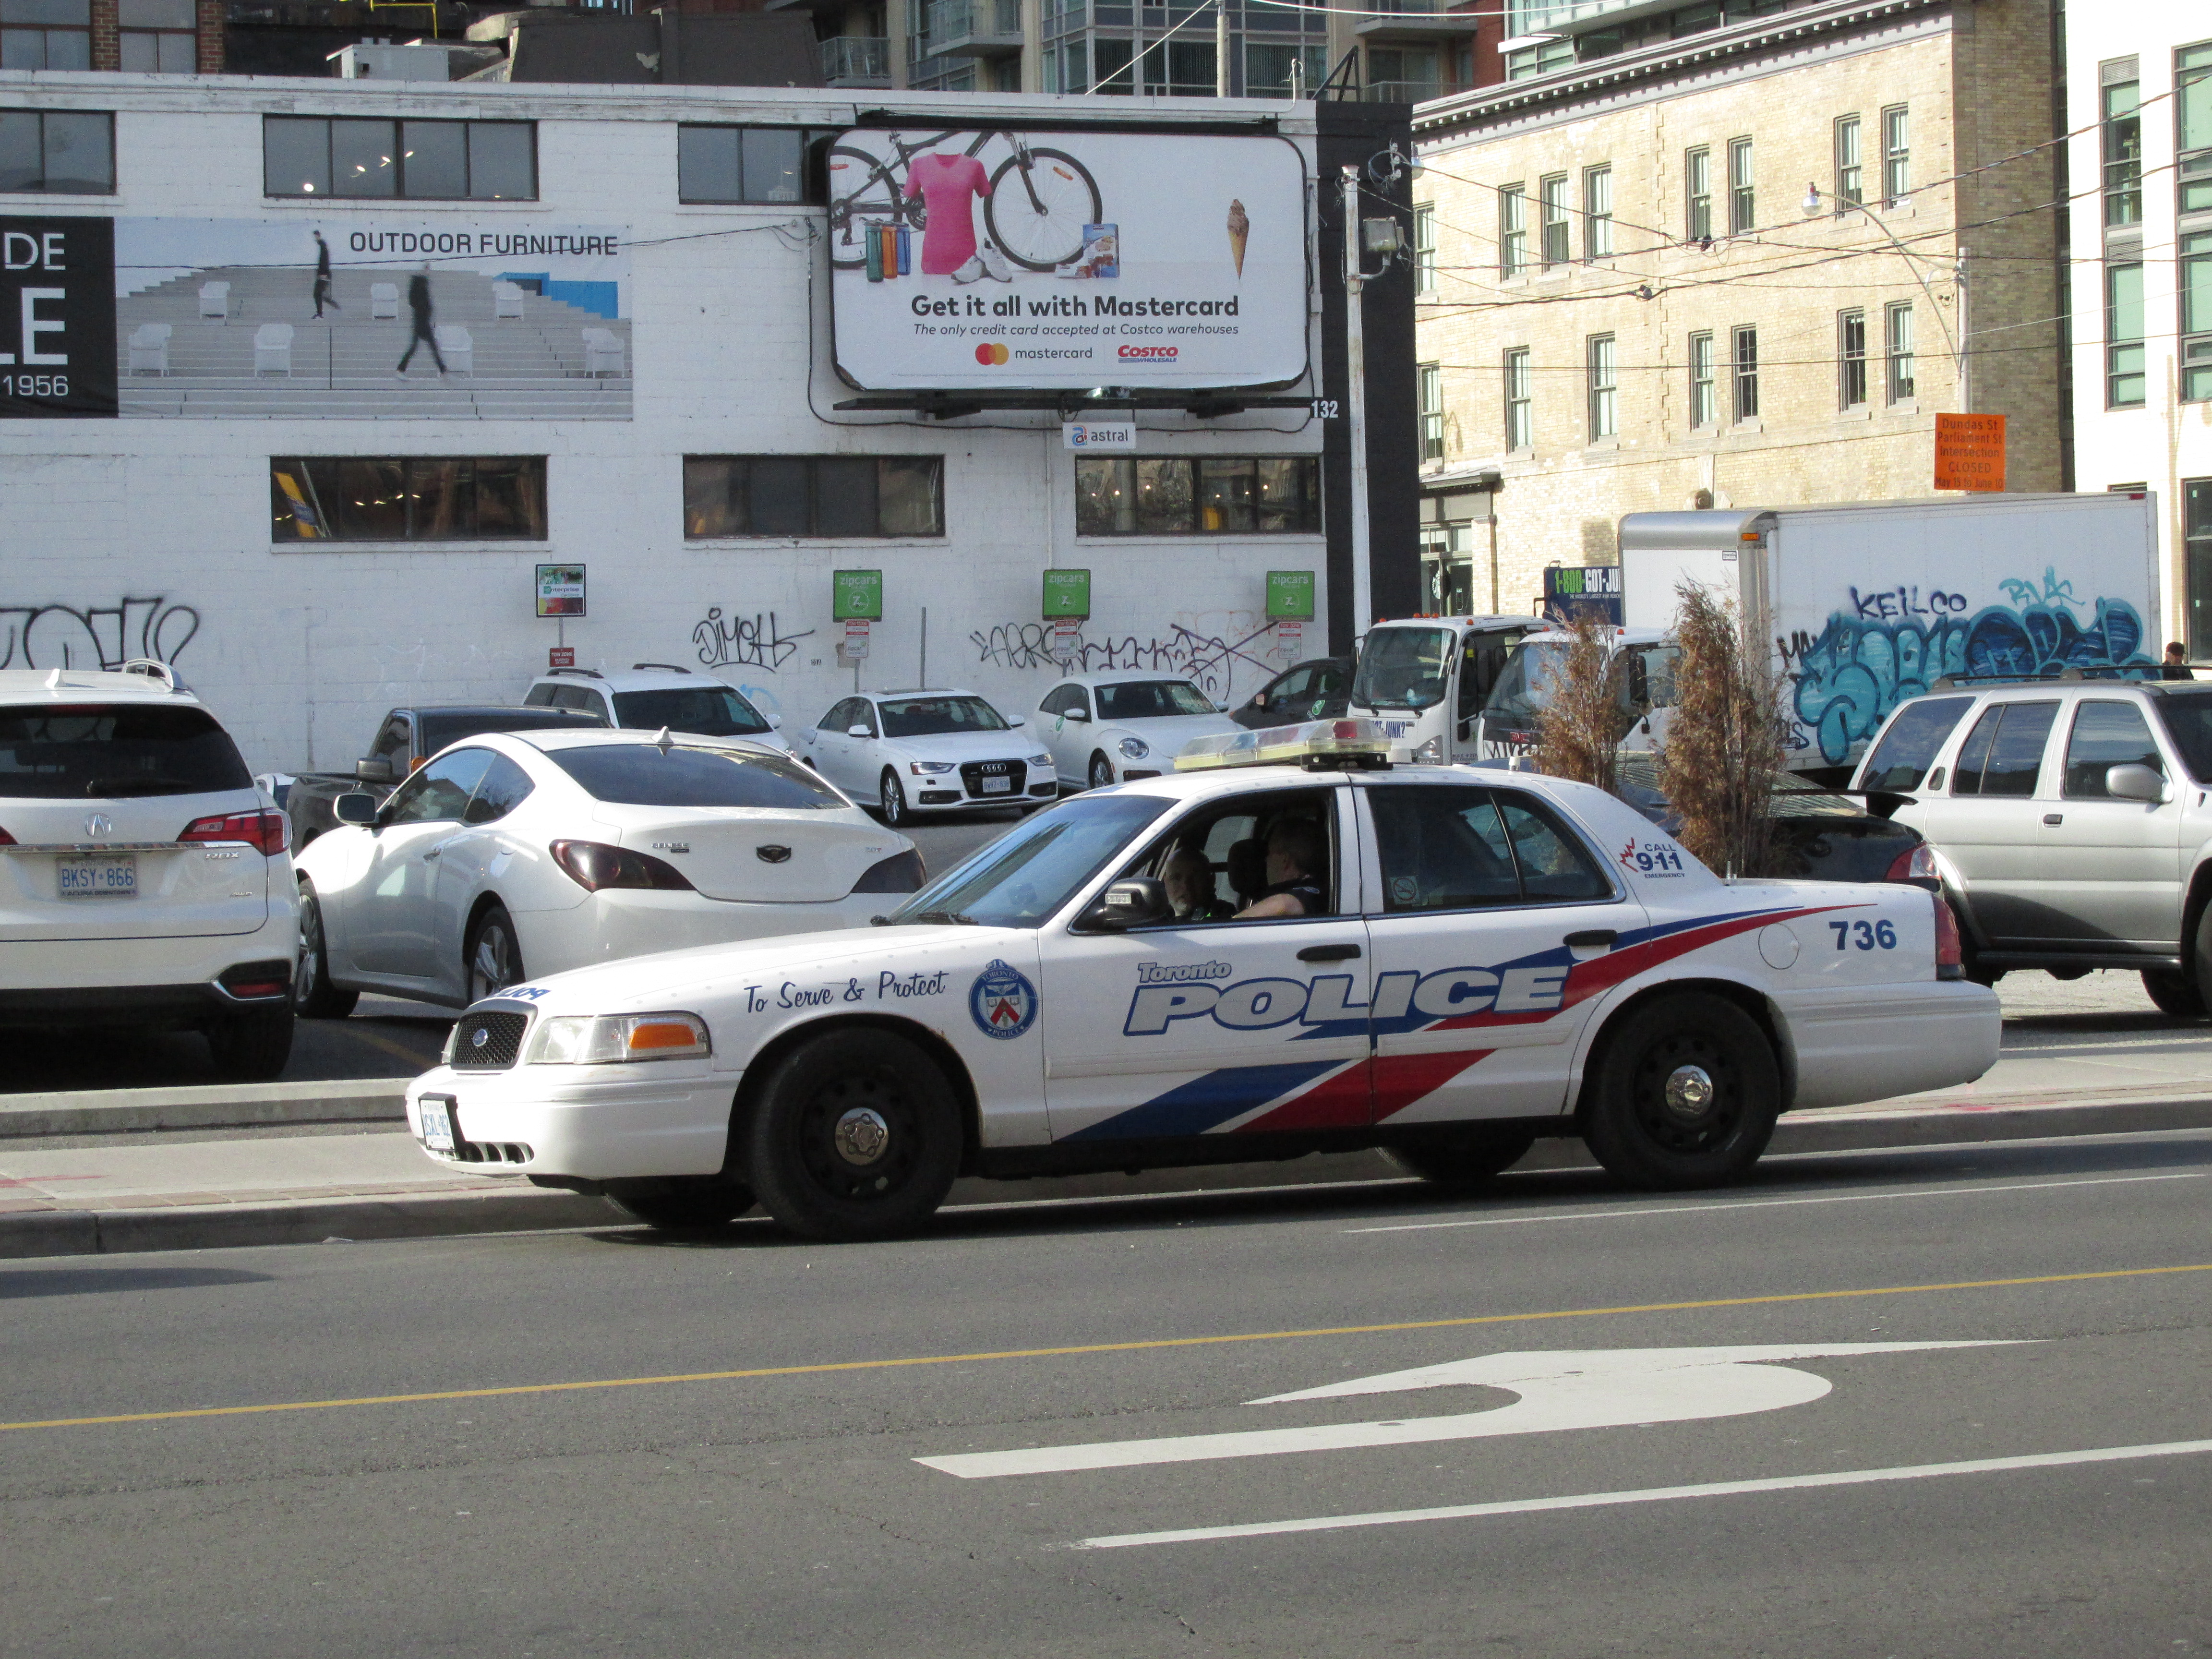 6890a8dec File:Toronto Police Cruiser 736.jpg - Wikimedia Commons